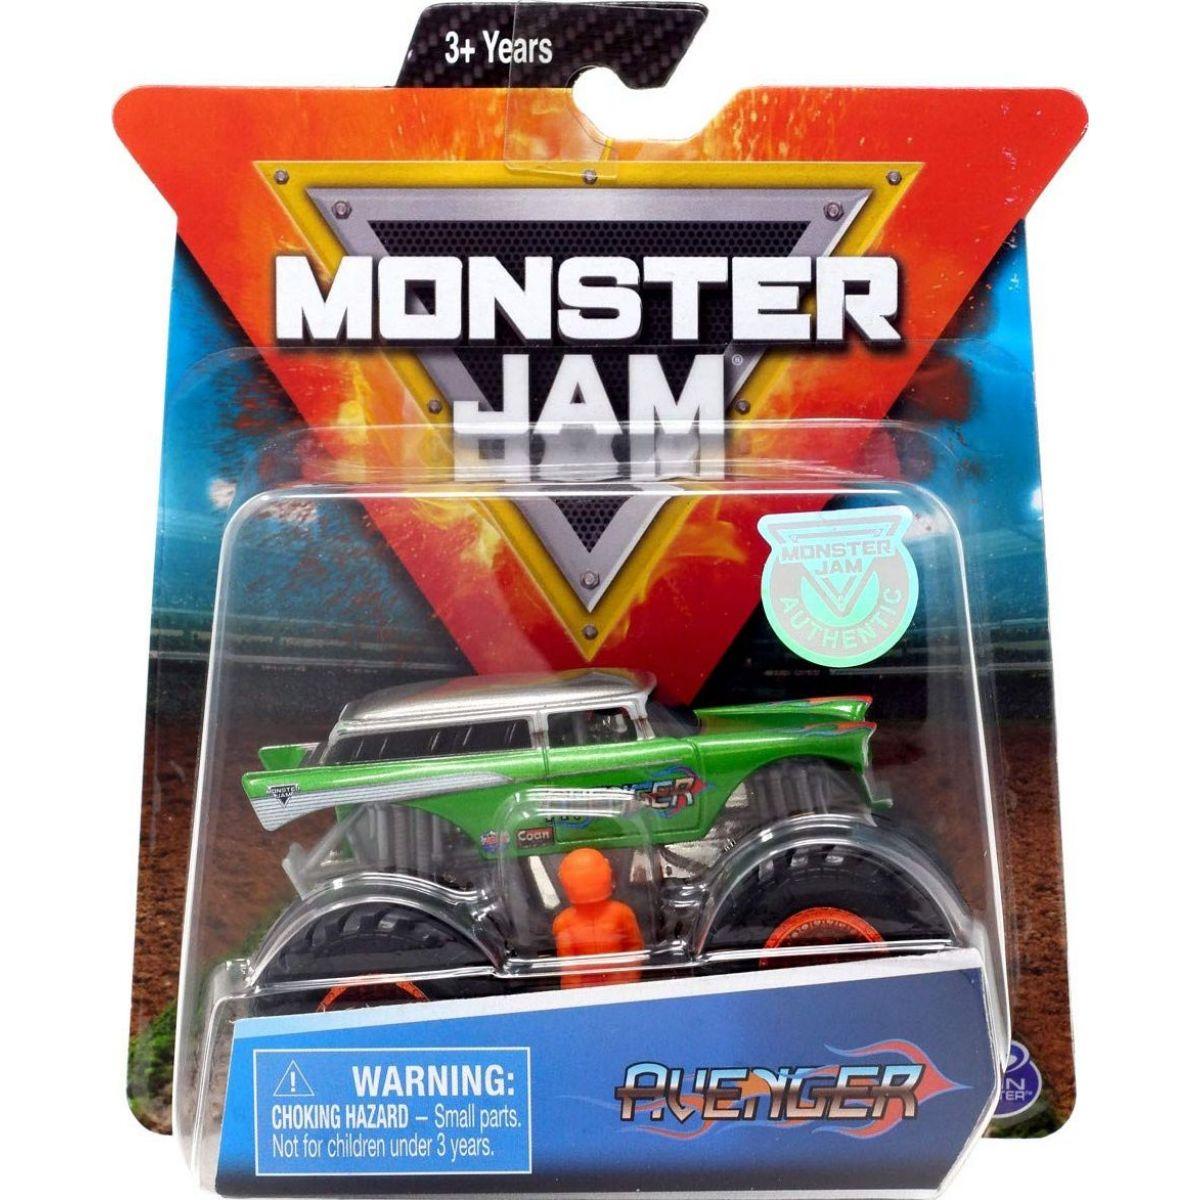 Monster Jam Zberateľská Die-Cast autá 1:64 Avenger